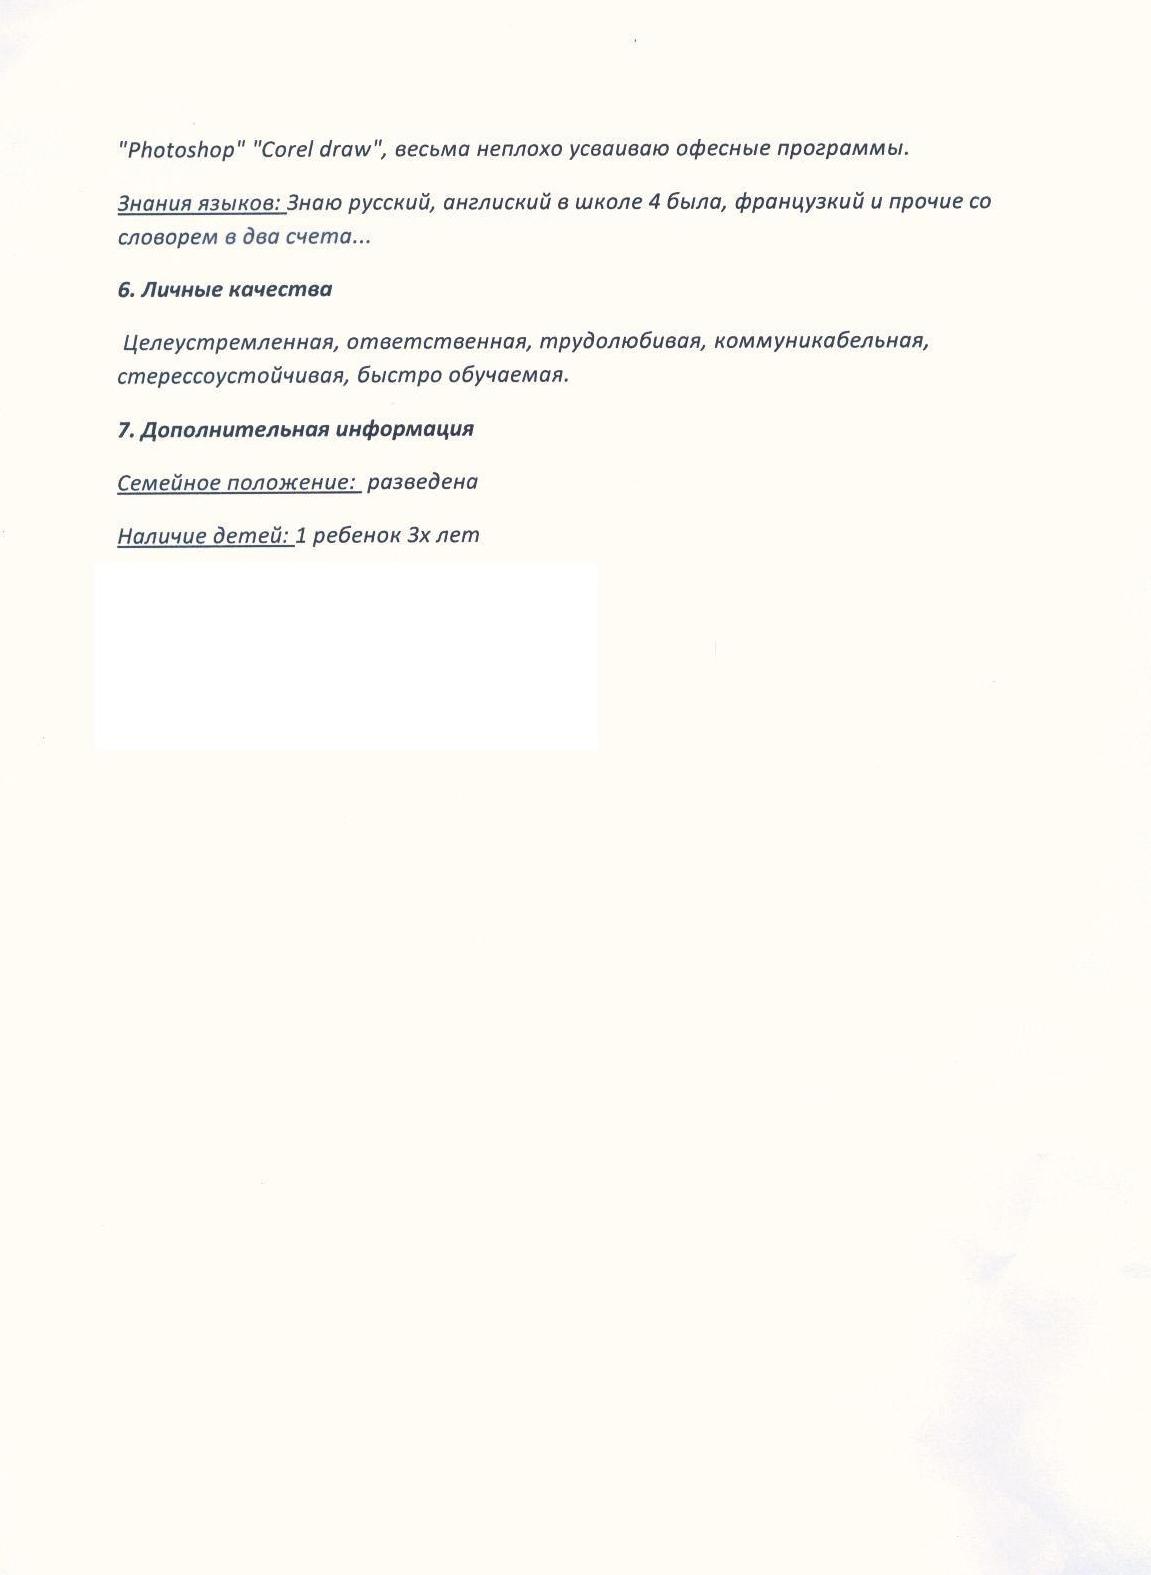 http://www.rulez-t.info/uploads/posts/2012-05/1337981939_04.jpg